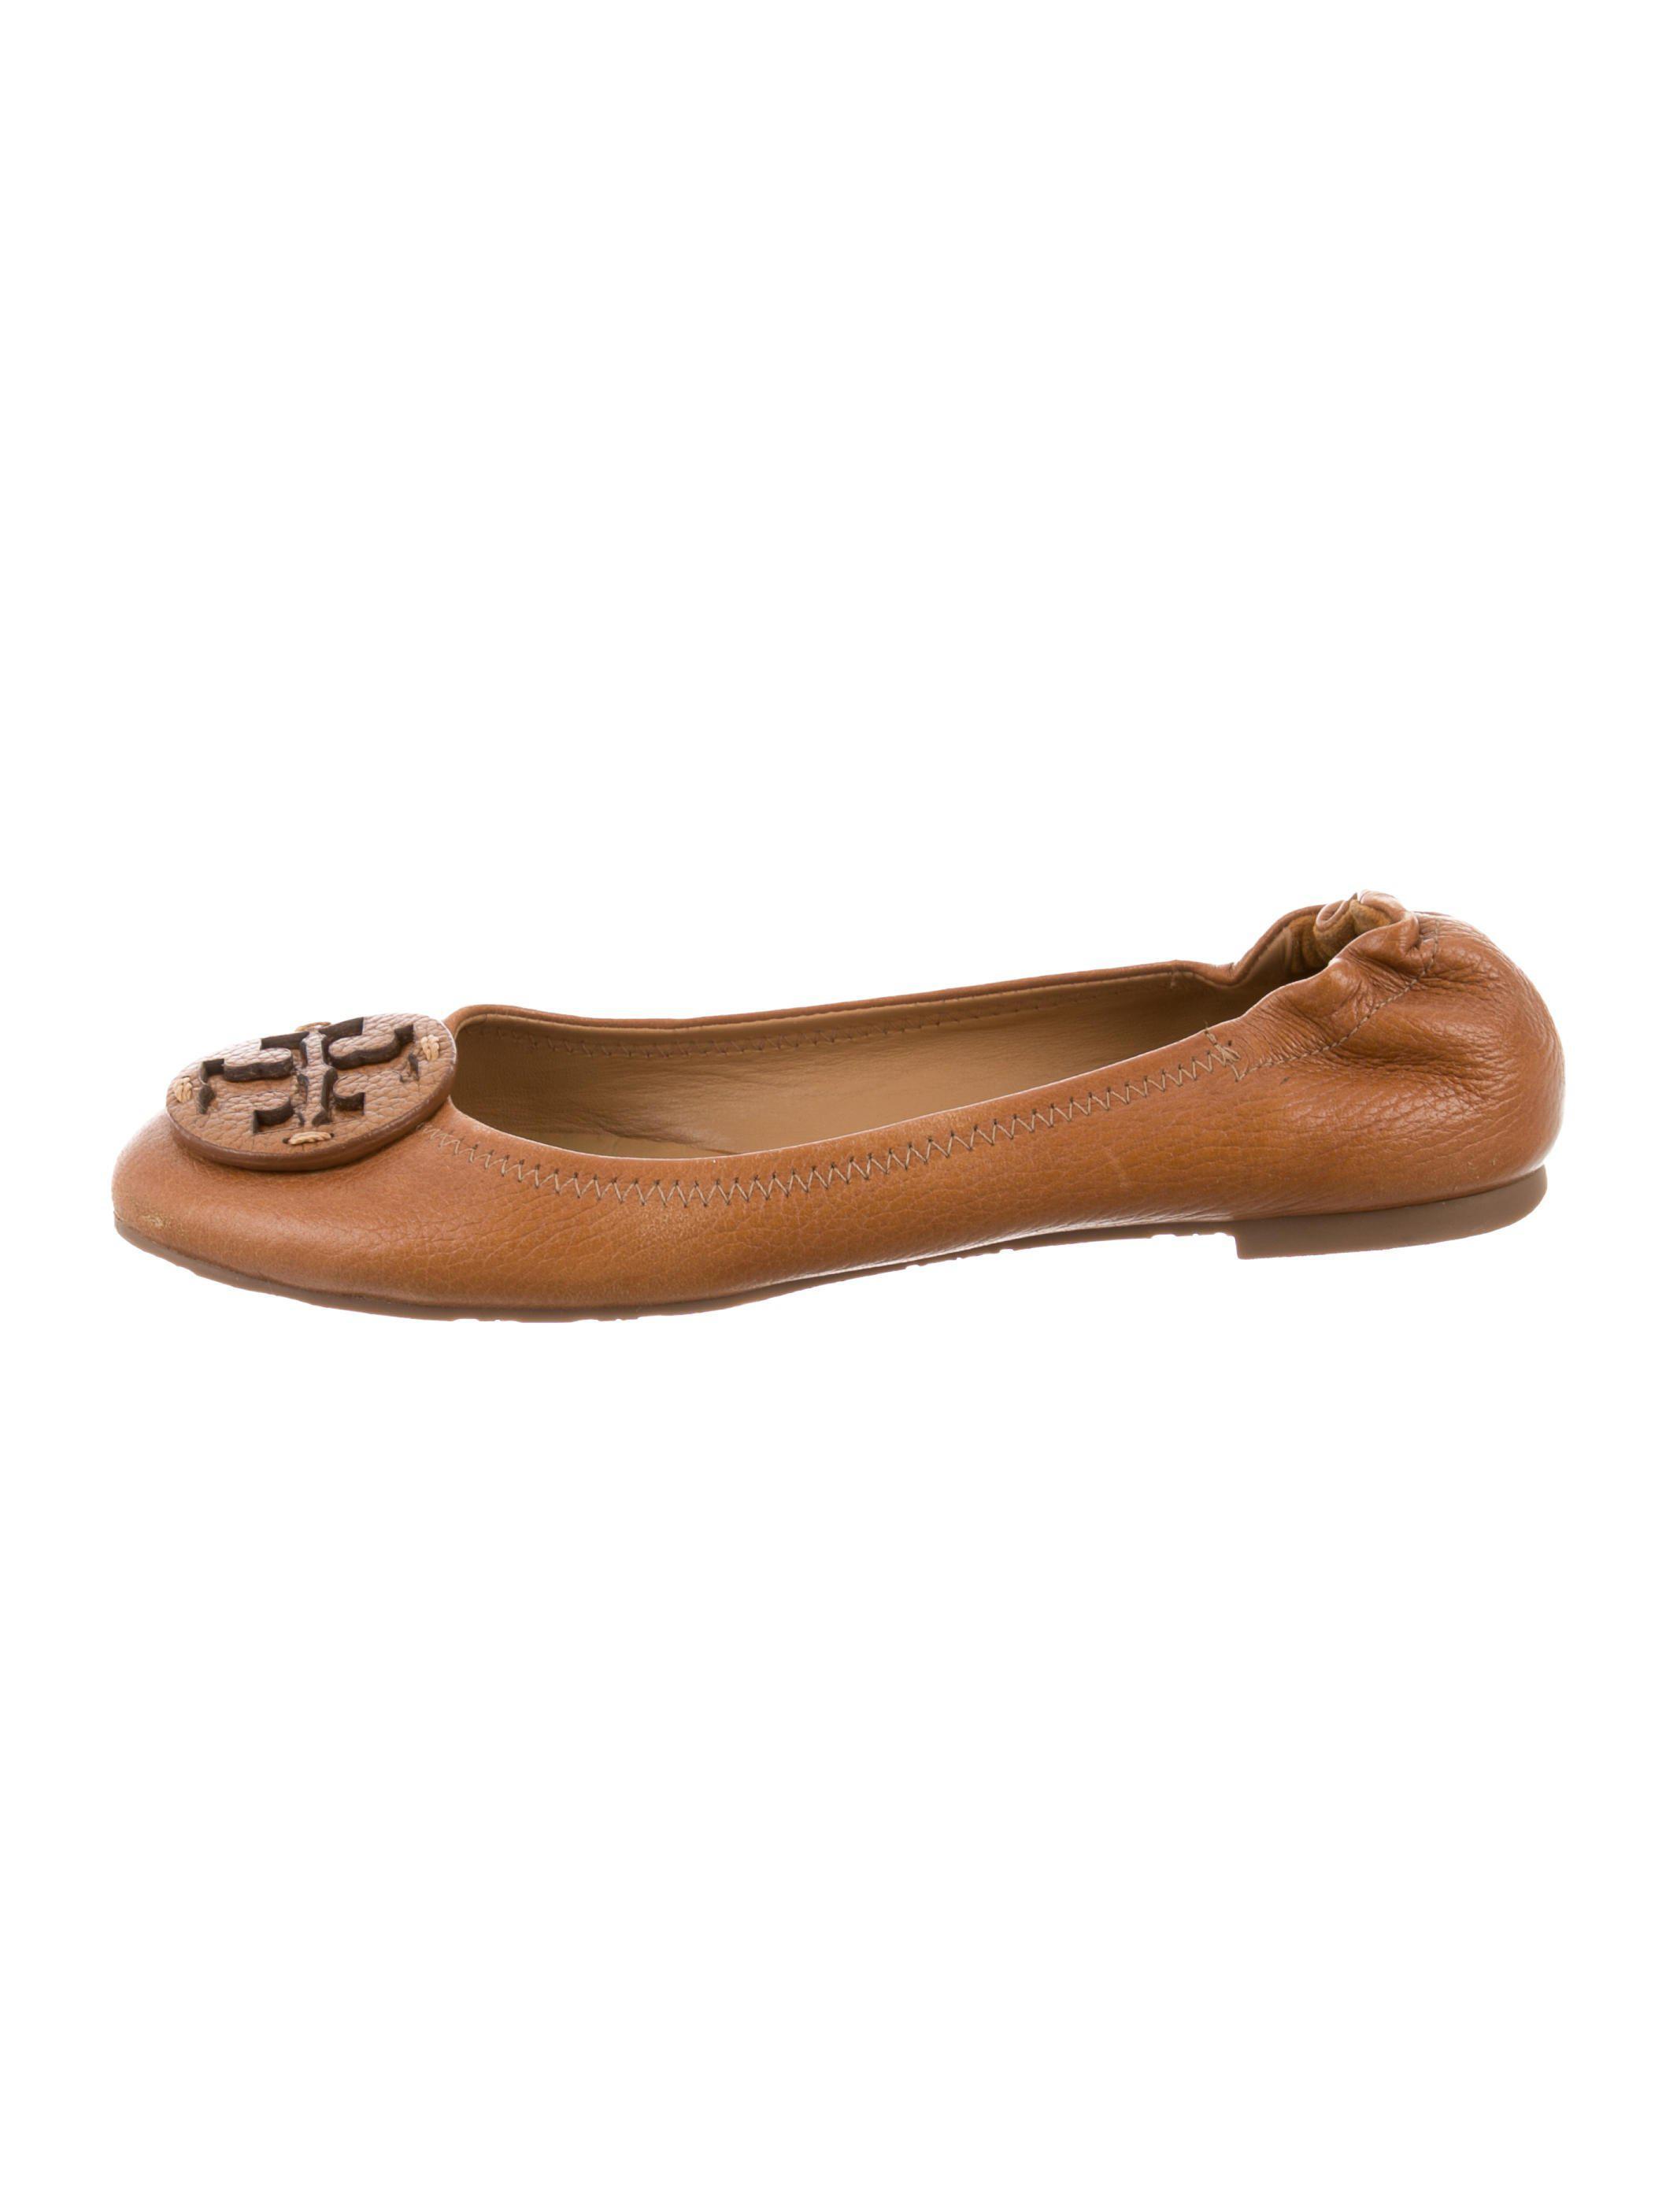 d085f74422c Lyst - Tory Burch Reva Round-toe Flats Brown in Metallic